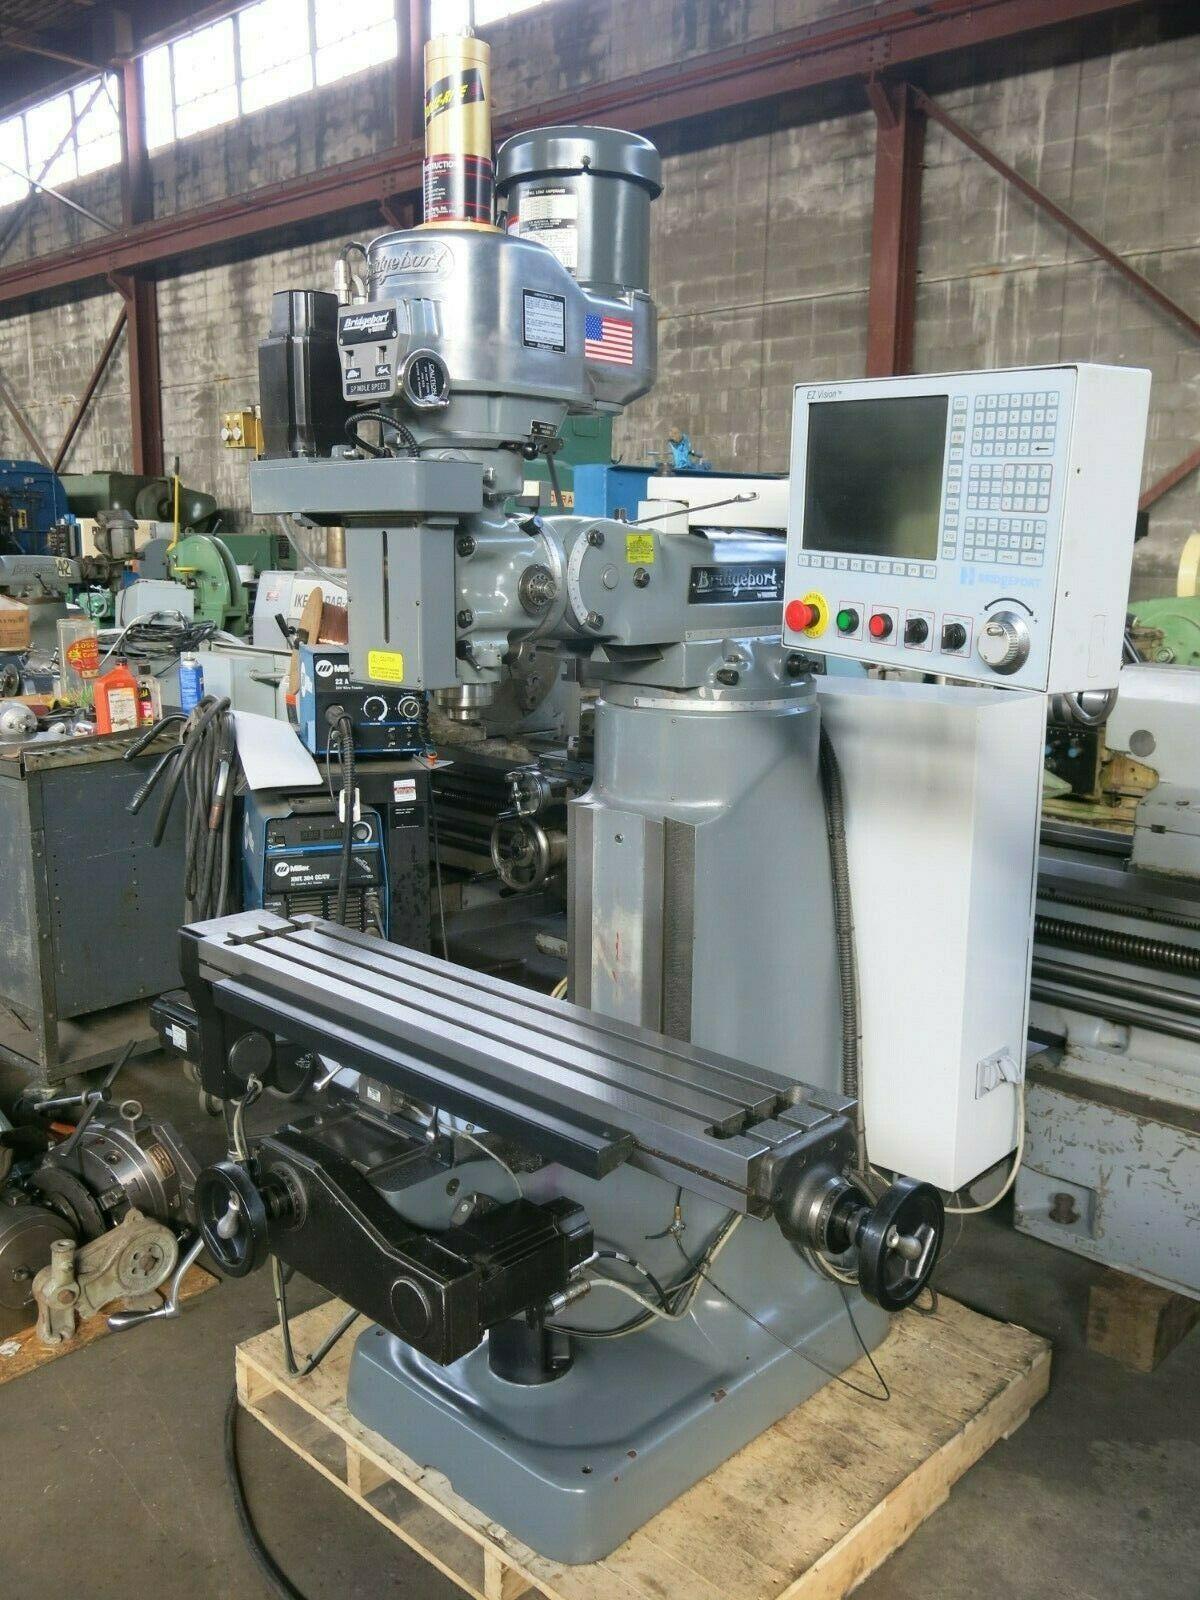 Photo Hardinge Bridgeport EZ Vision 9x48 3 Axis CNC Milling Machine